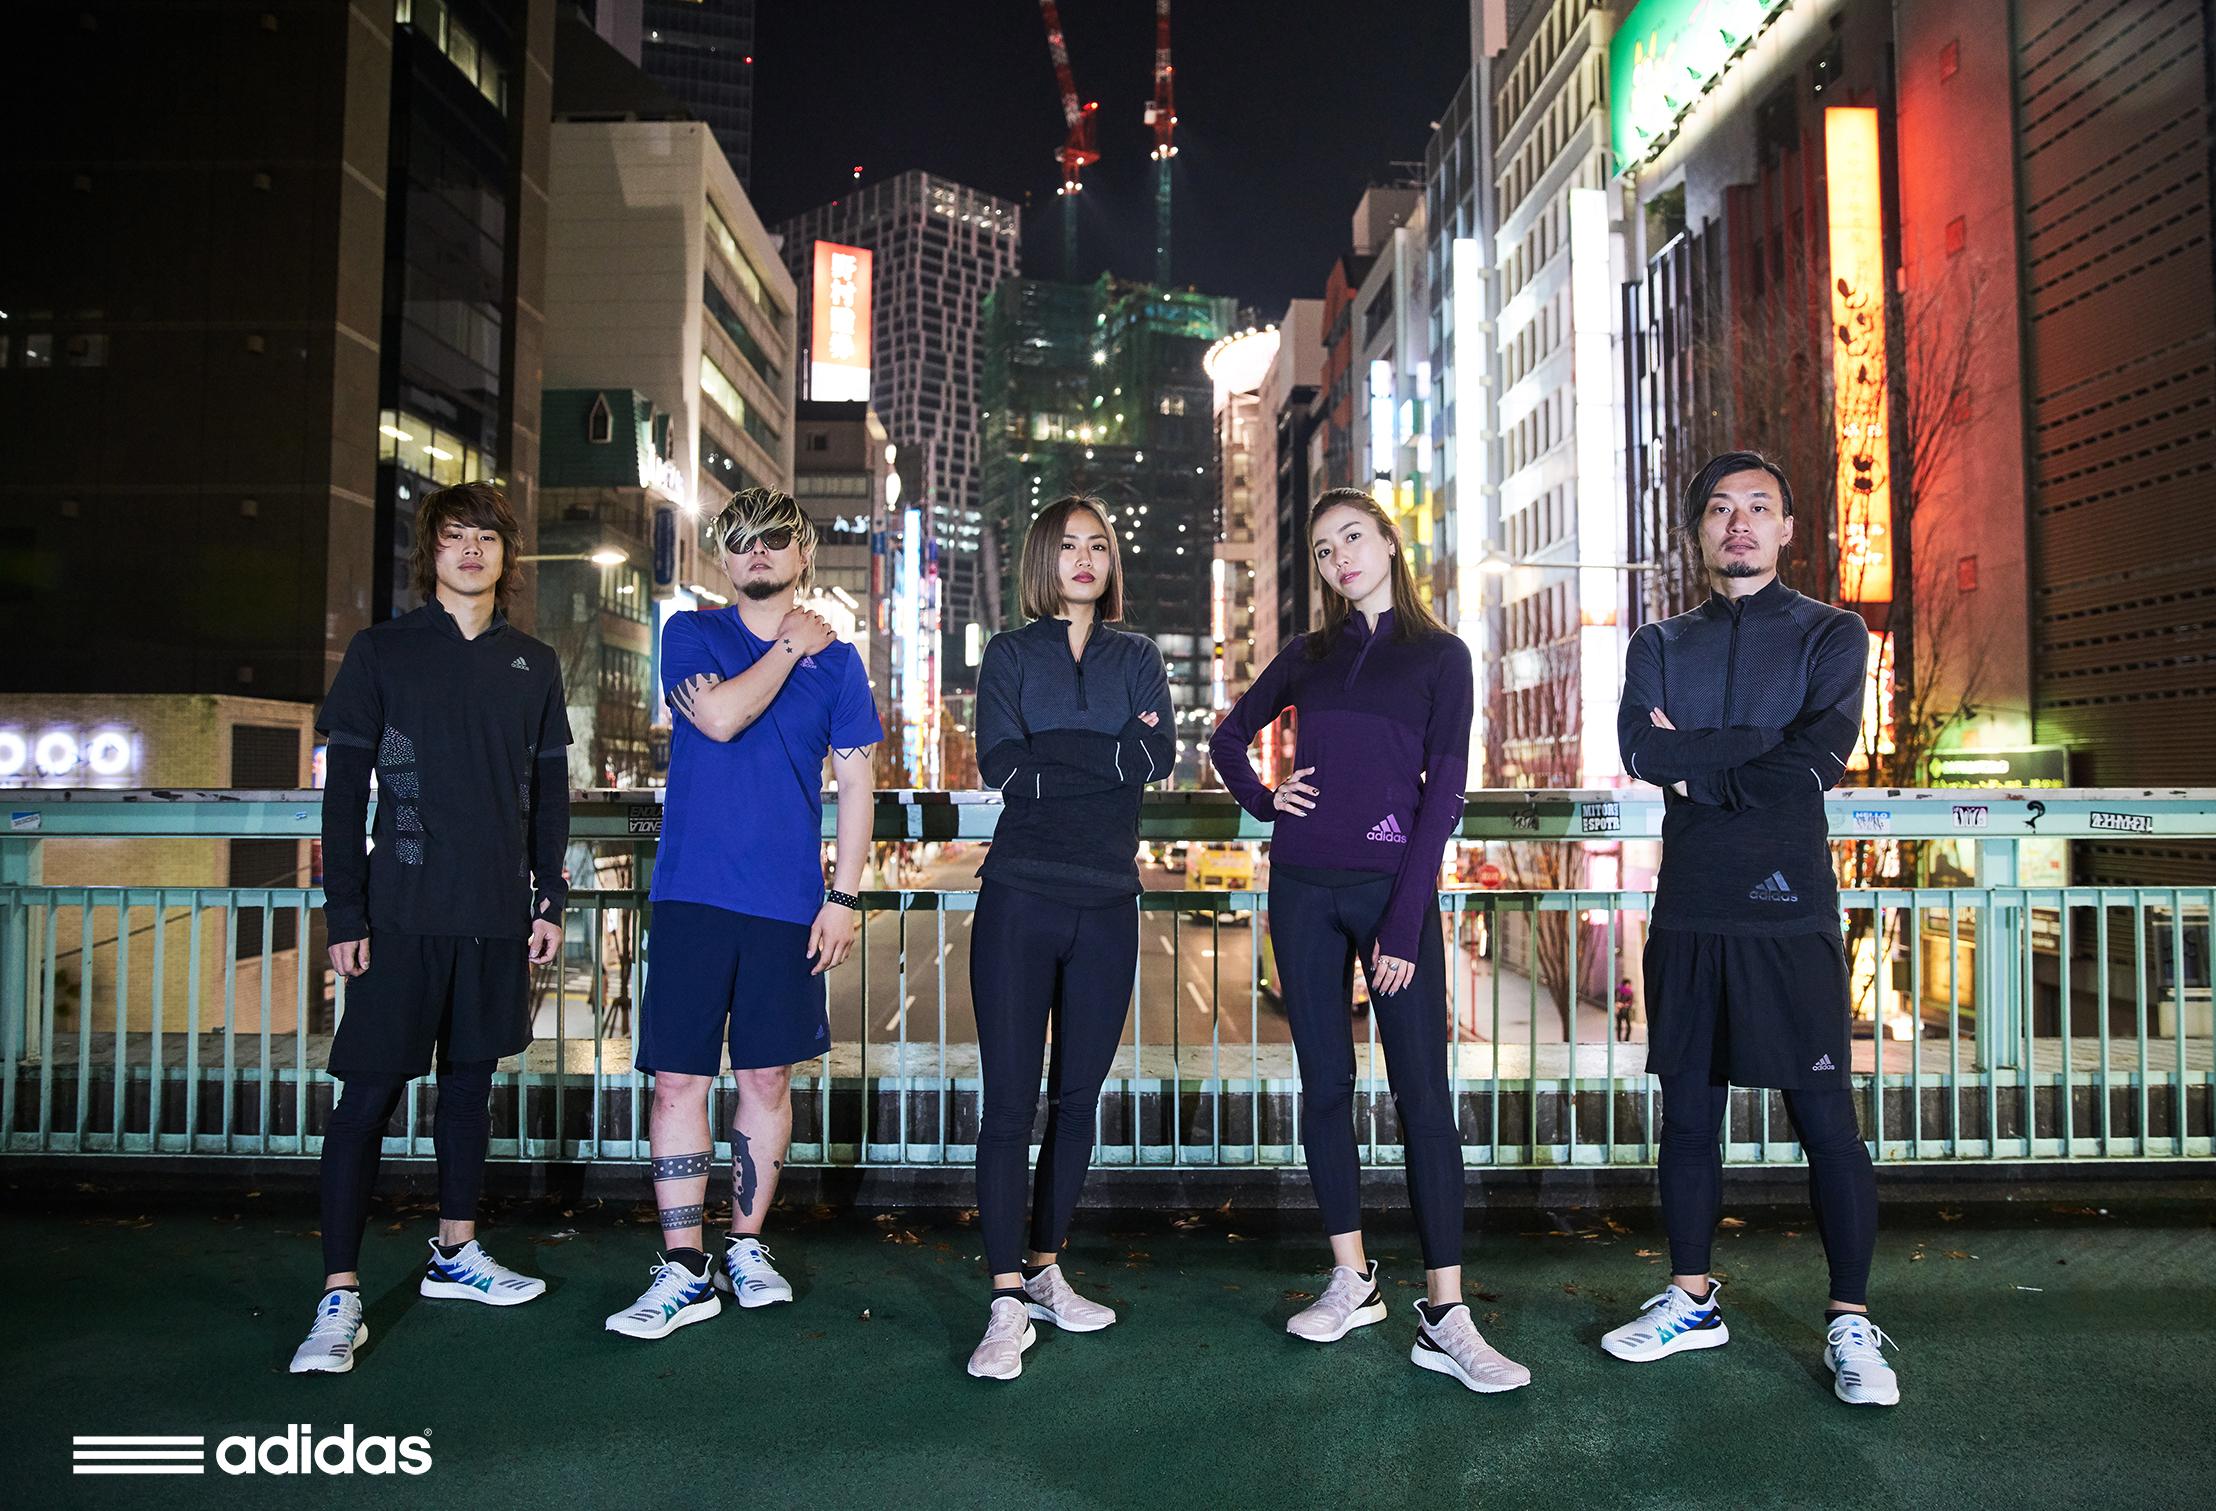 AM4TKY Adidas Japan